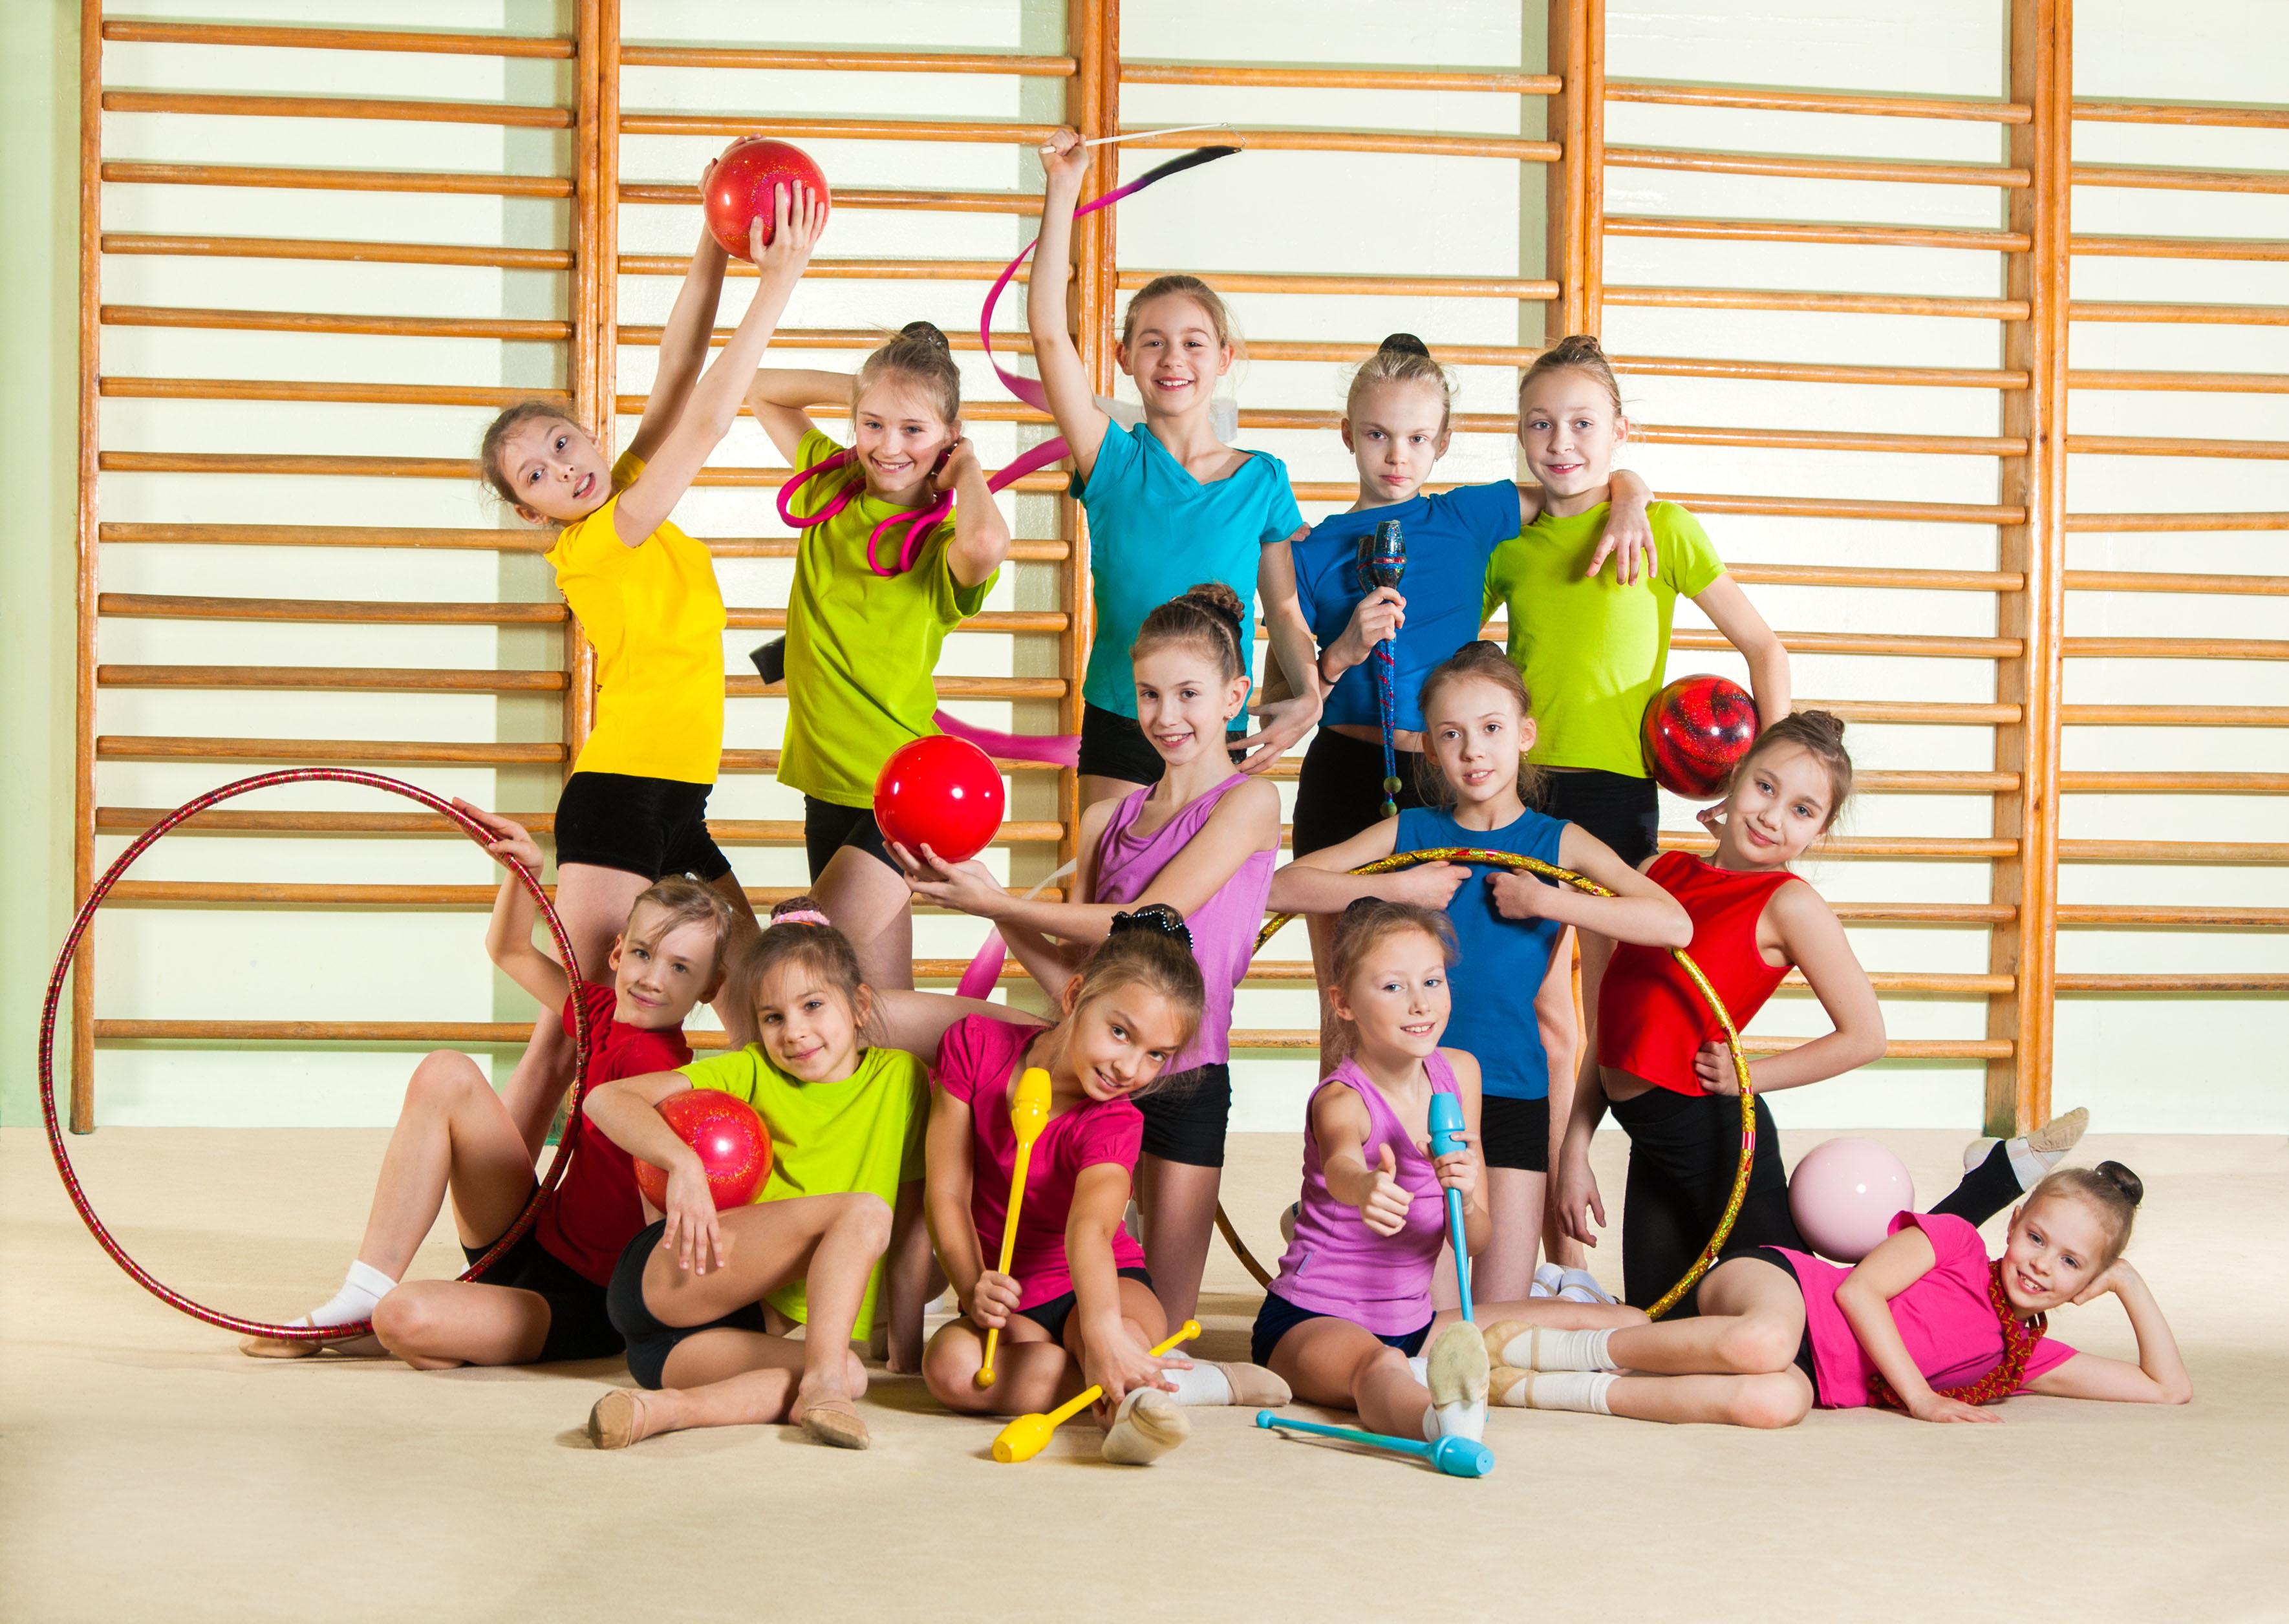 Groupon gym deals nyc